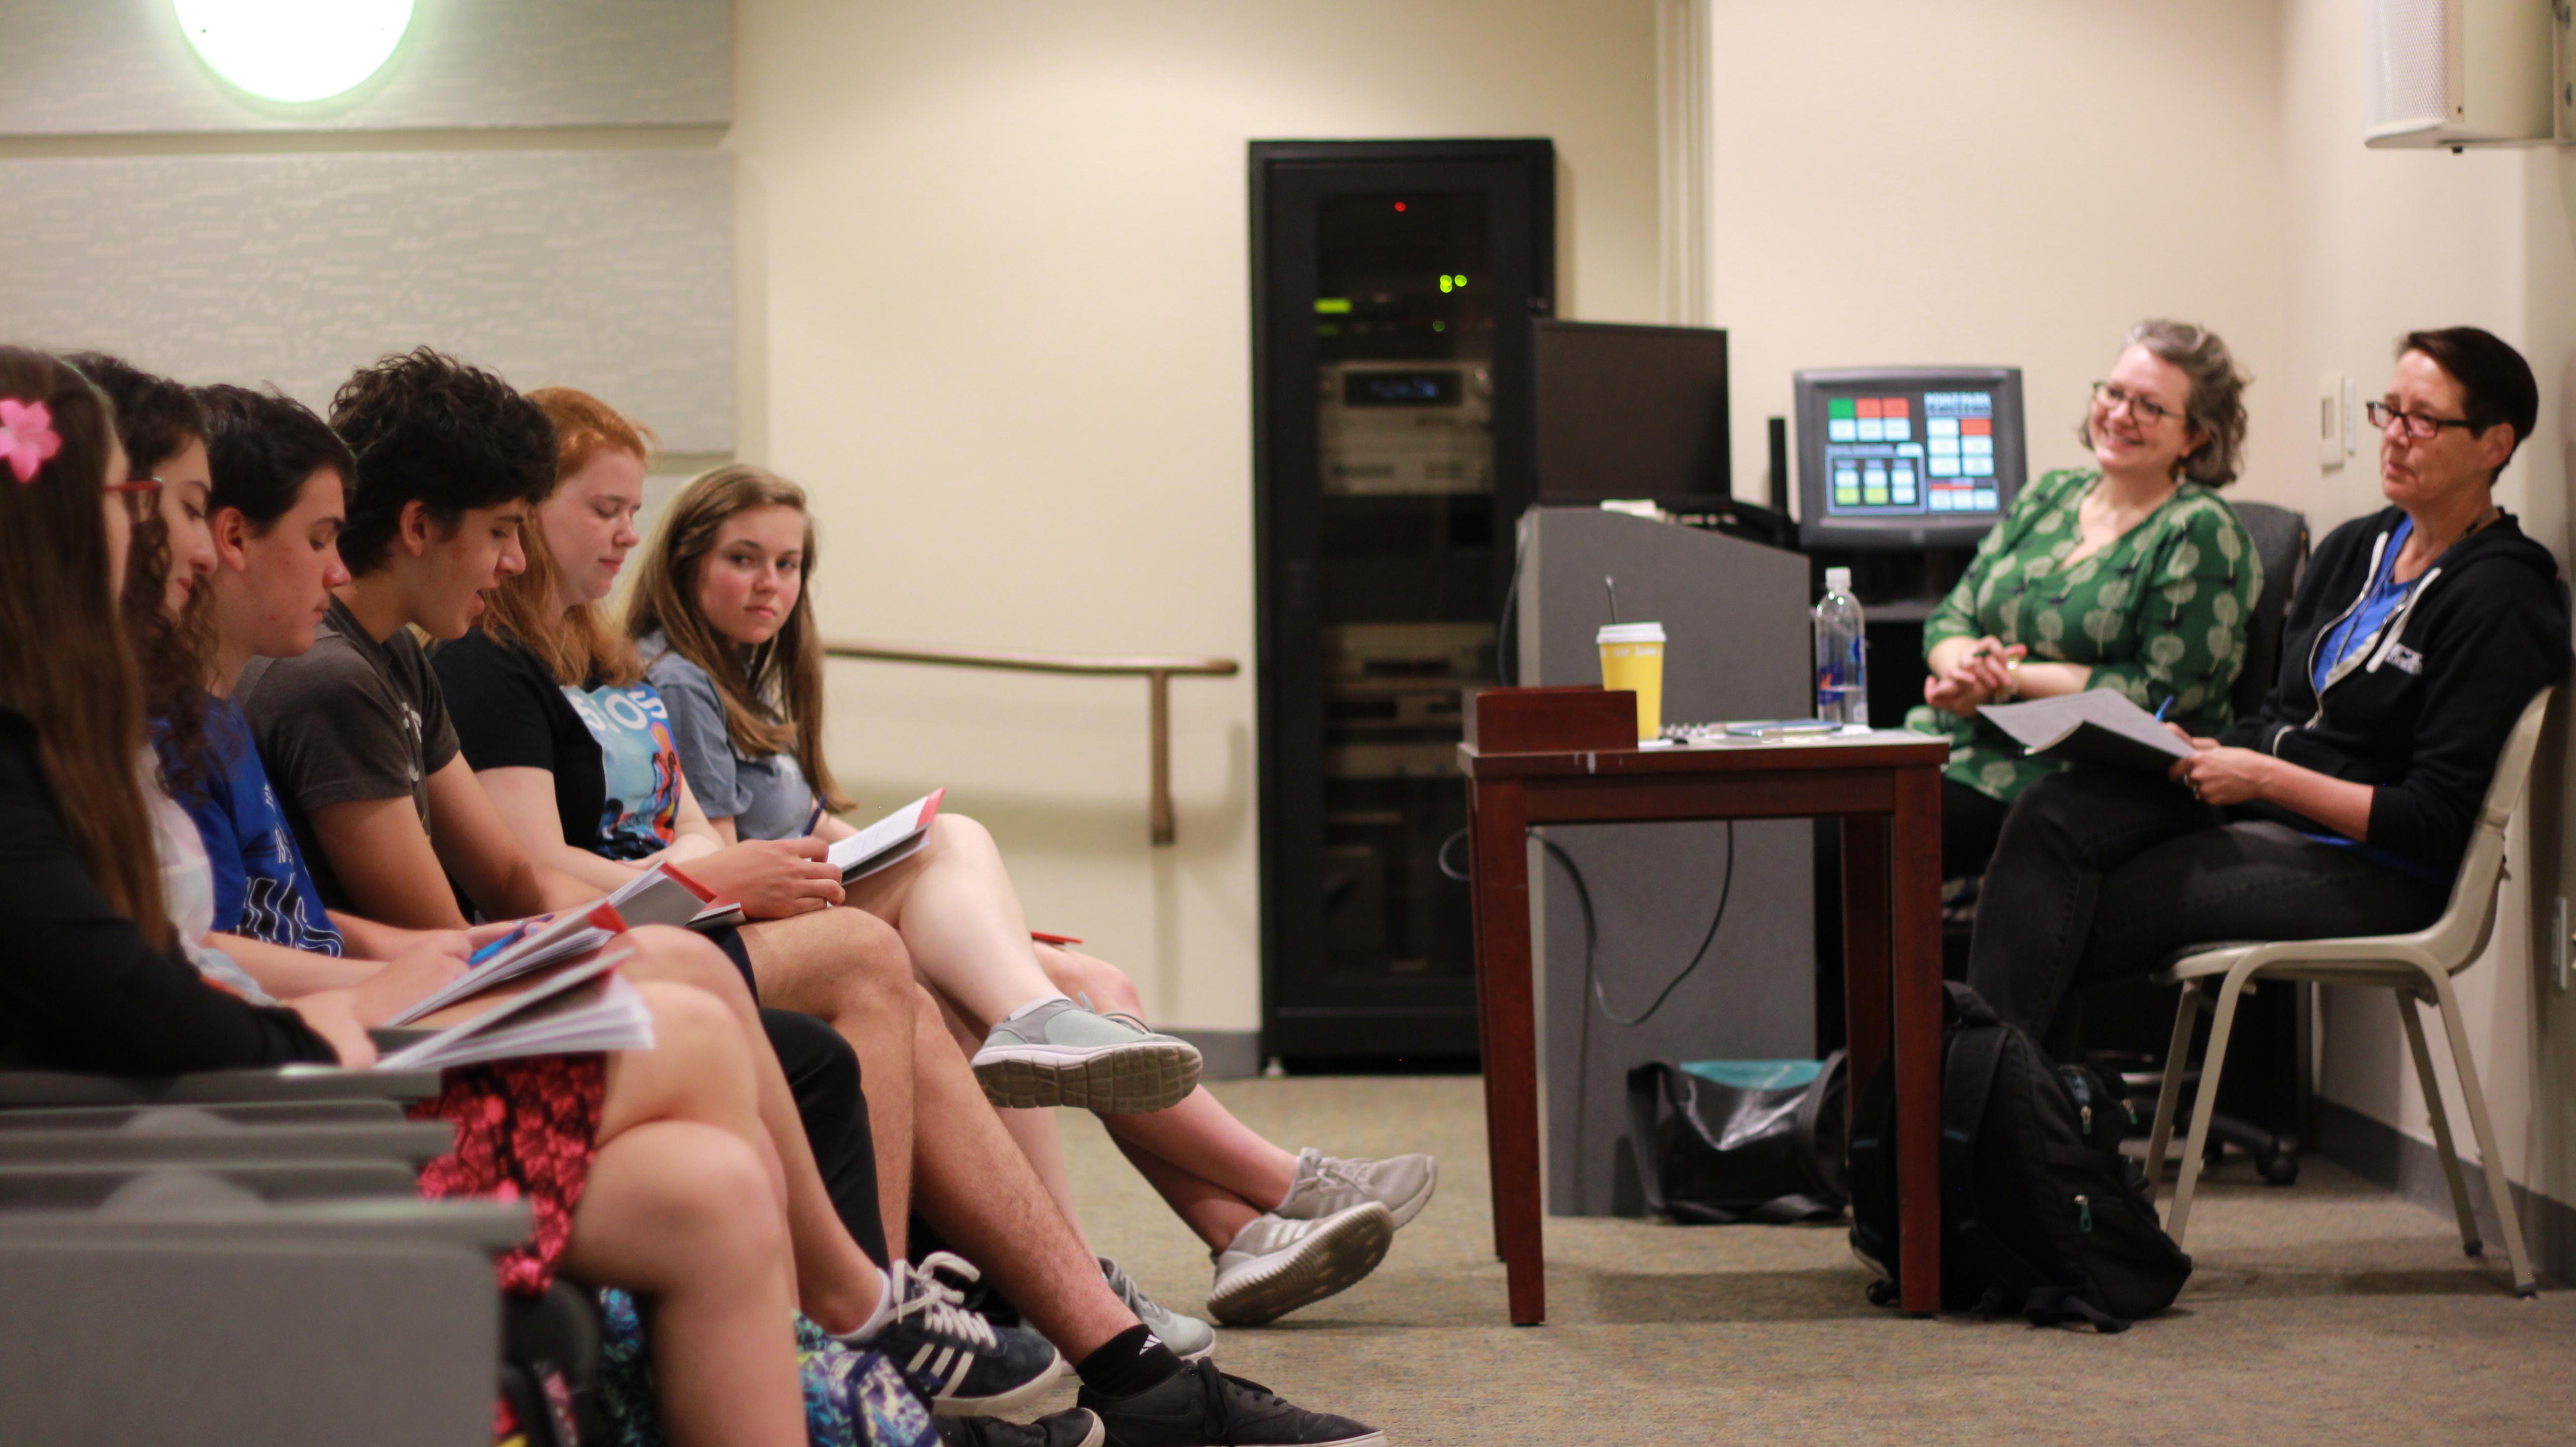 Summer Program - Filmmaking and Digital Media | Point Park University: Screenwriting Intensive